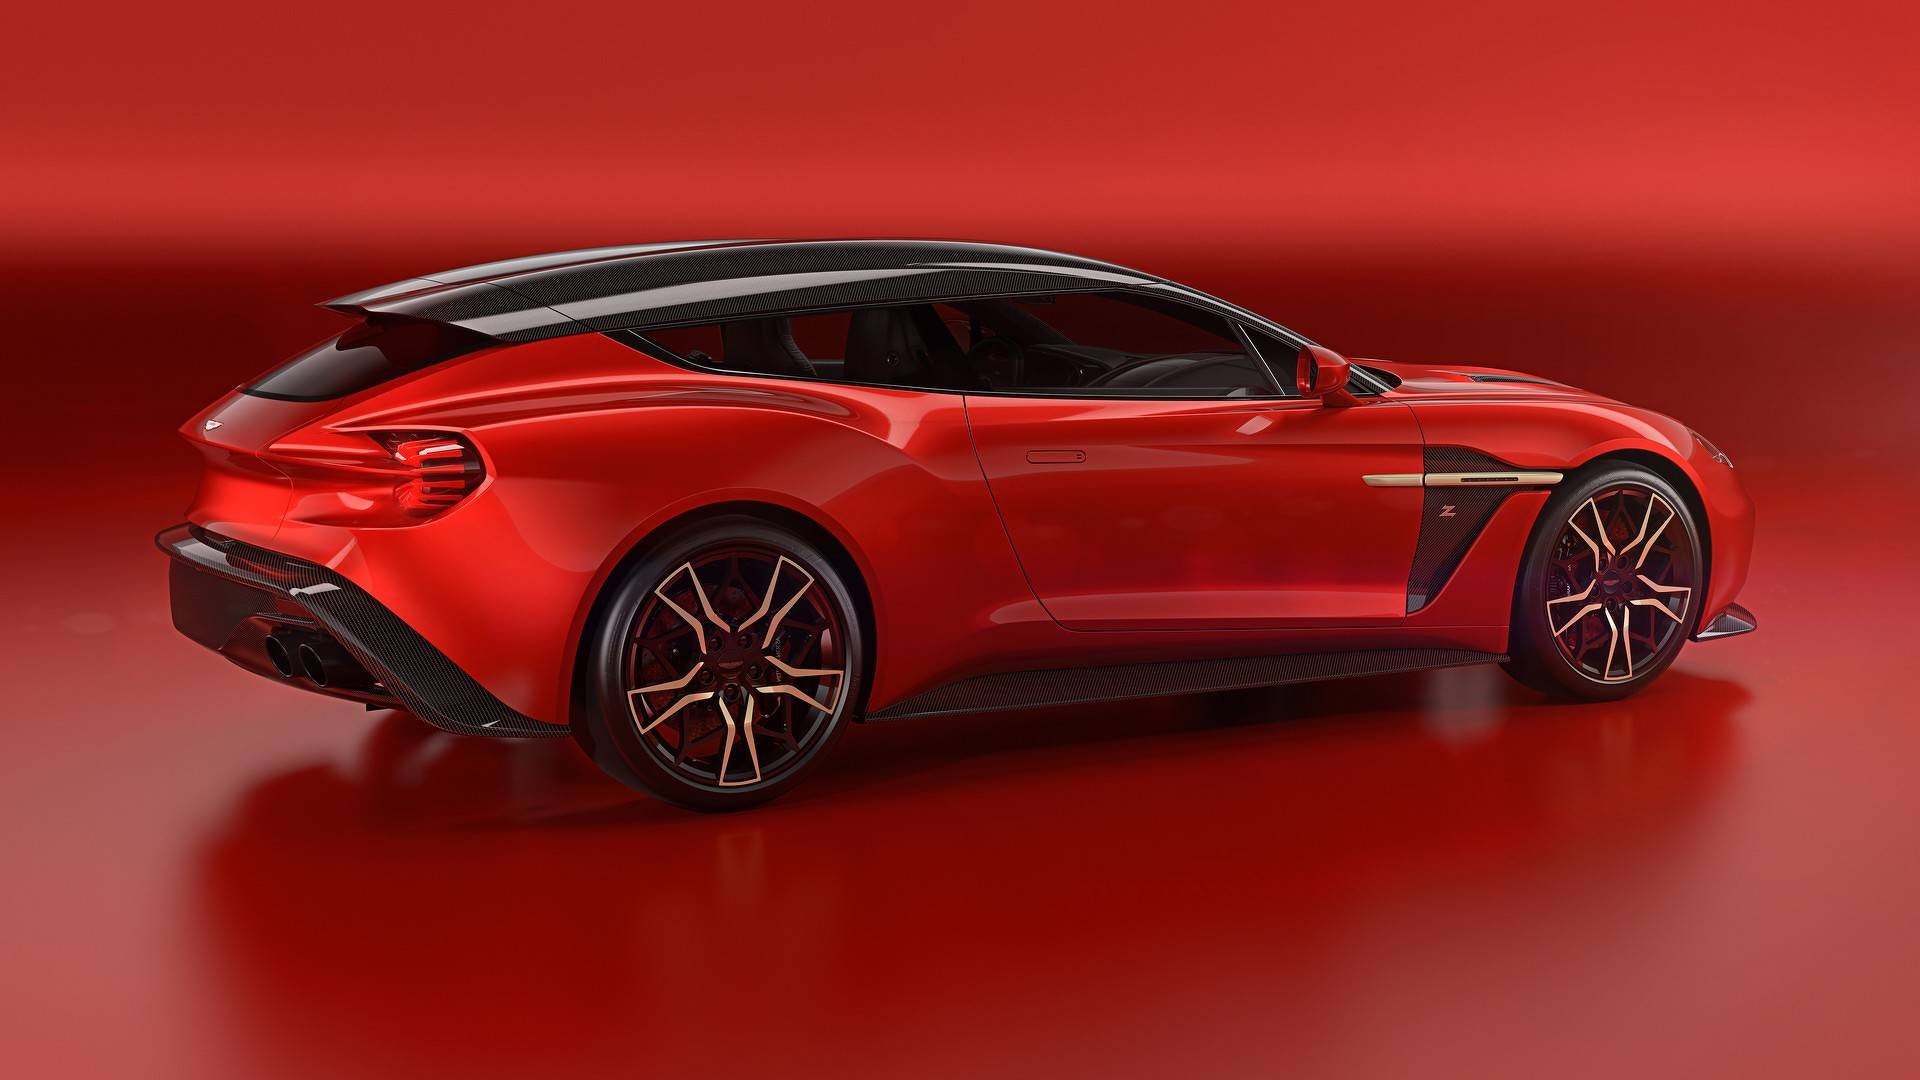 Aston Martin Unveil The Vanquish Zagato Shooting Brake ( Its Not Family Friendly) advise